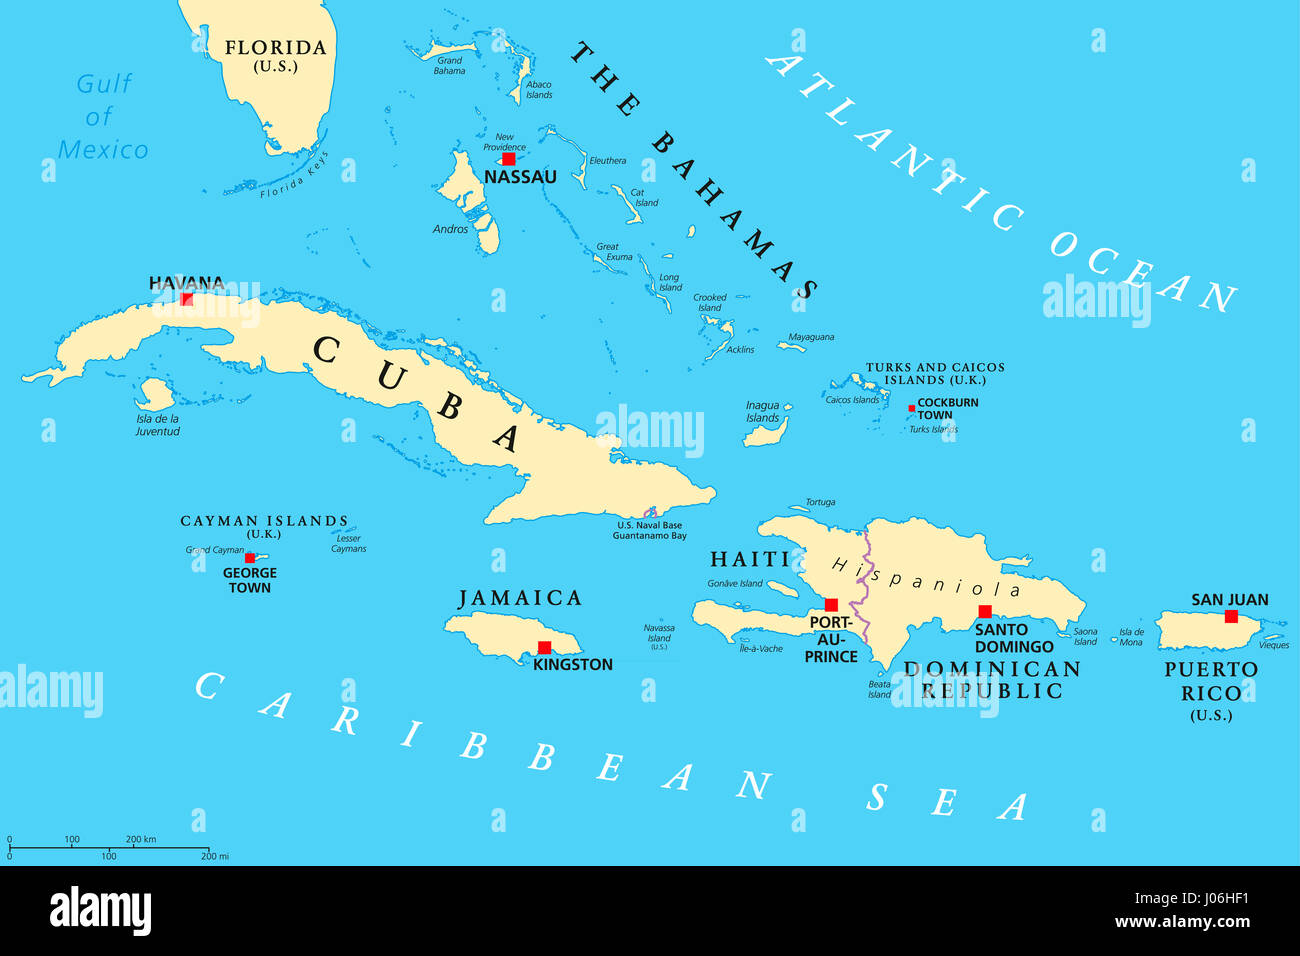 Politische Karte der groen Antillen Karibik Kuba Jamaika